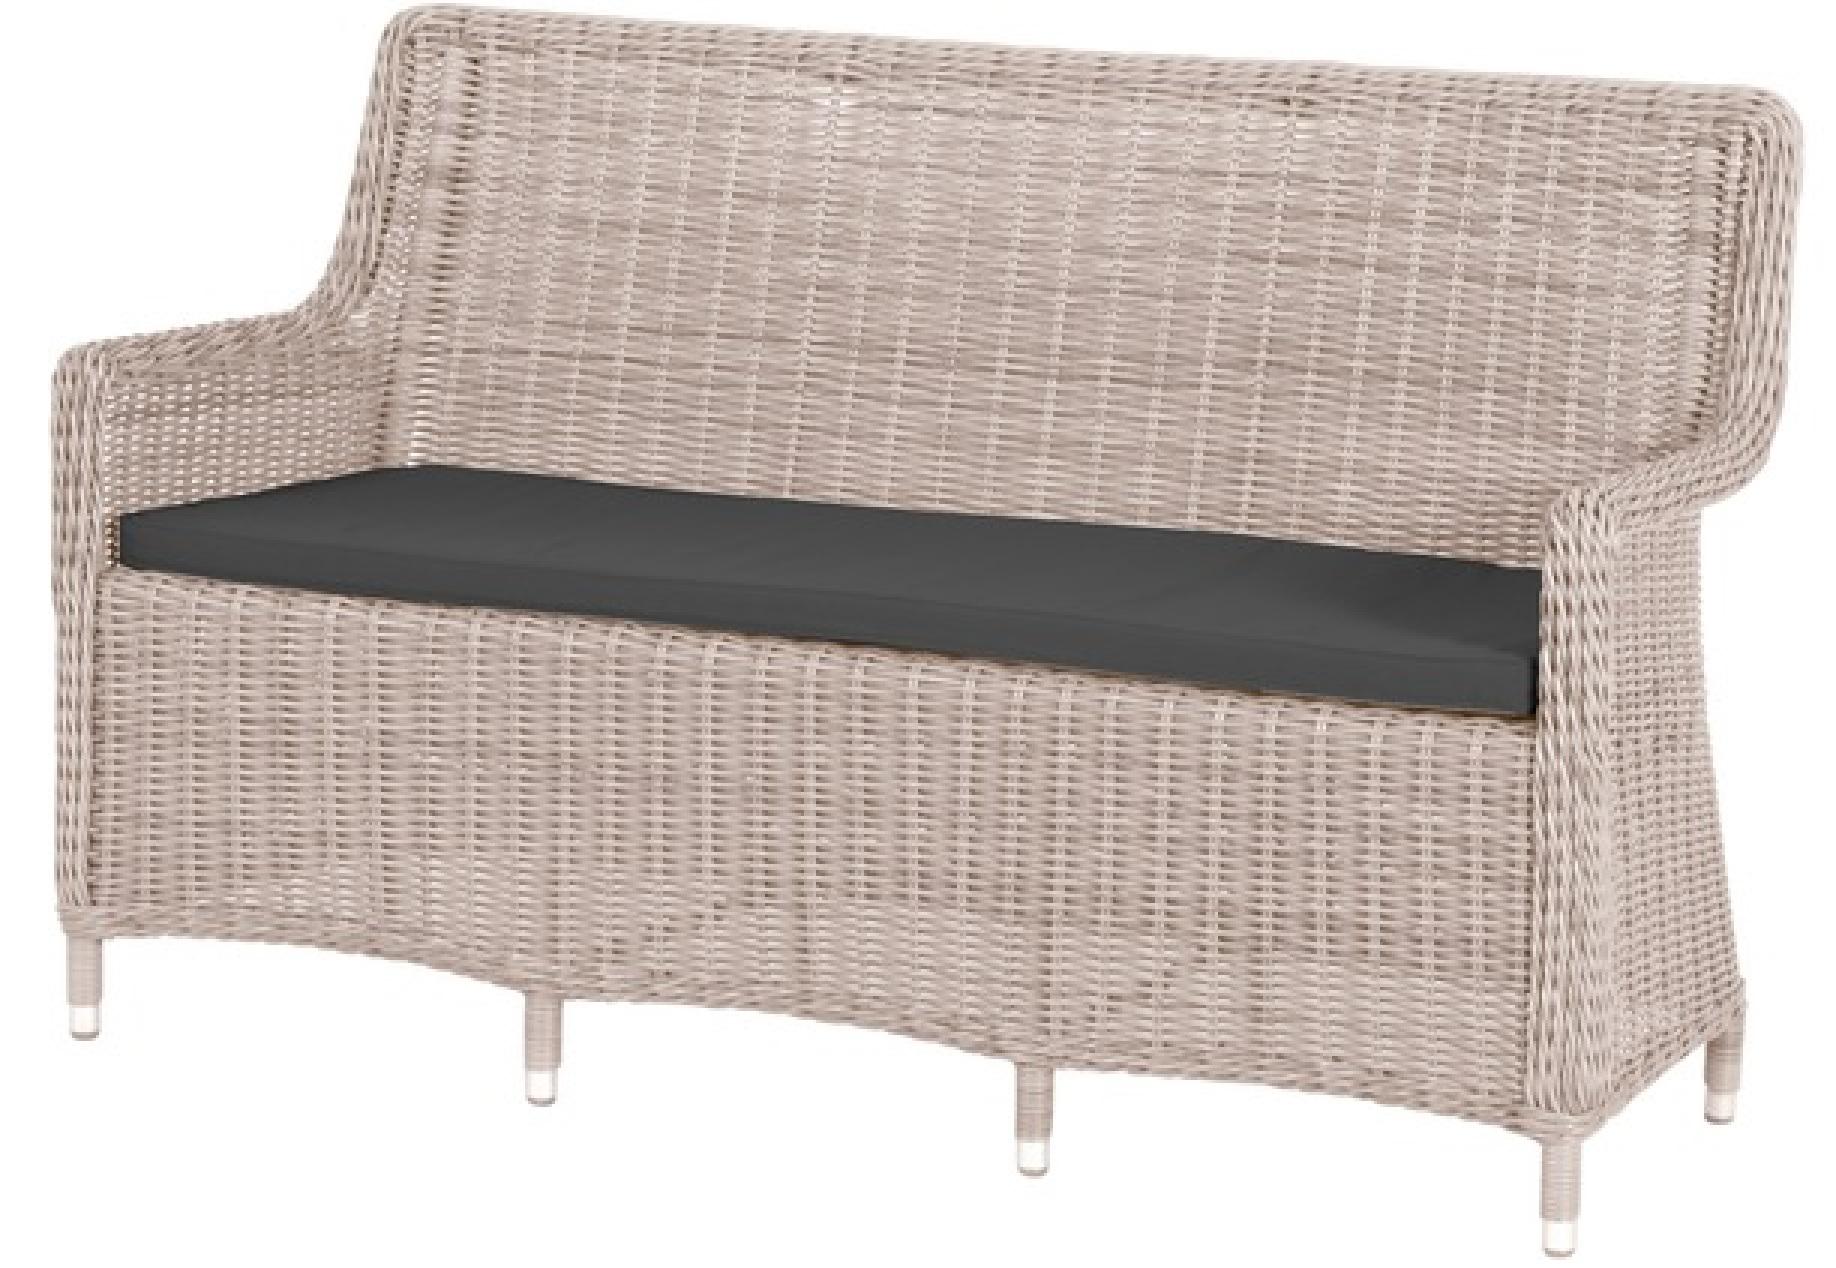 pesaro polyrattan 3er gartenbank 156x96x64cm whitewash gartenb nke garten gartenm bel. Black Bedroom Furniture Sets. Home Design Ideas